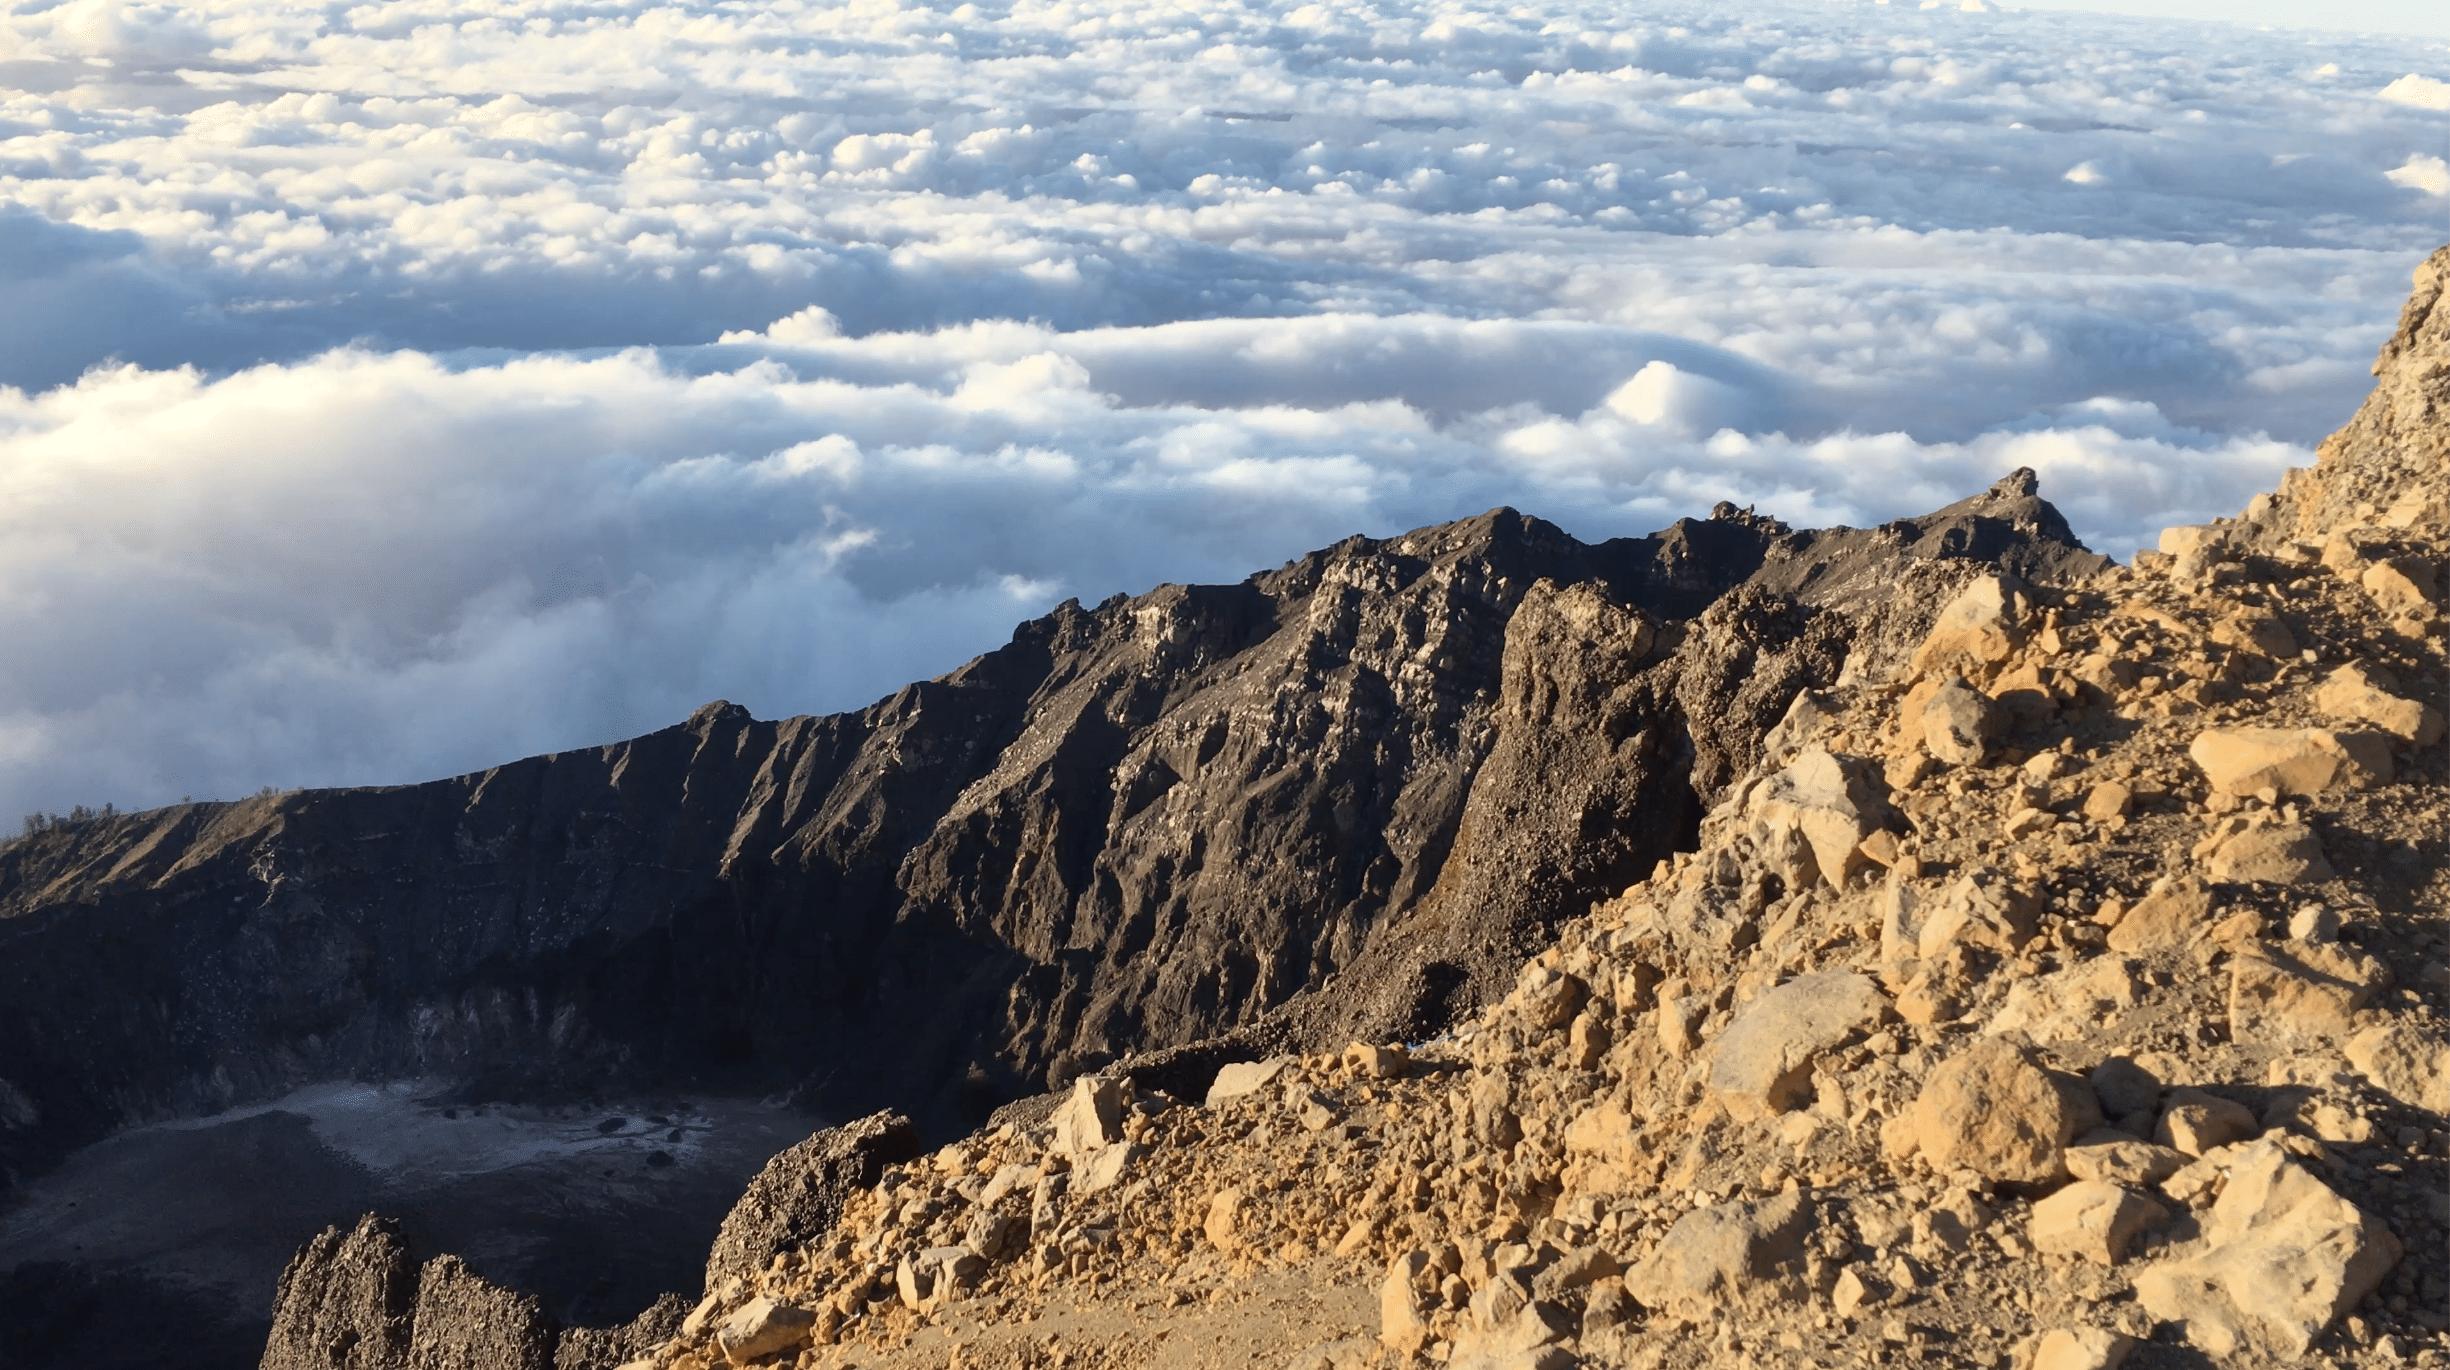 sommet du mont rinjani en indonesie